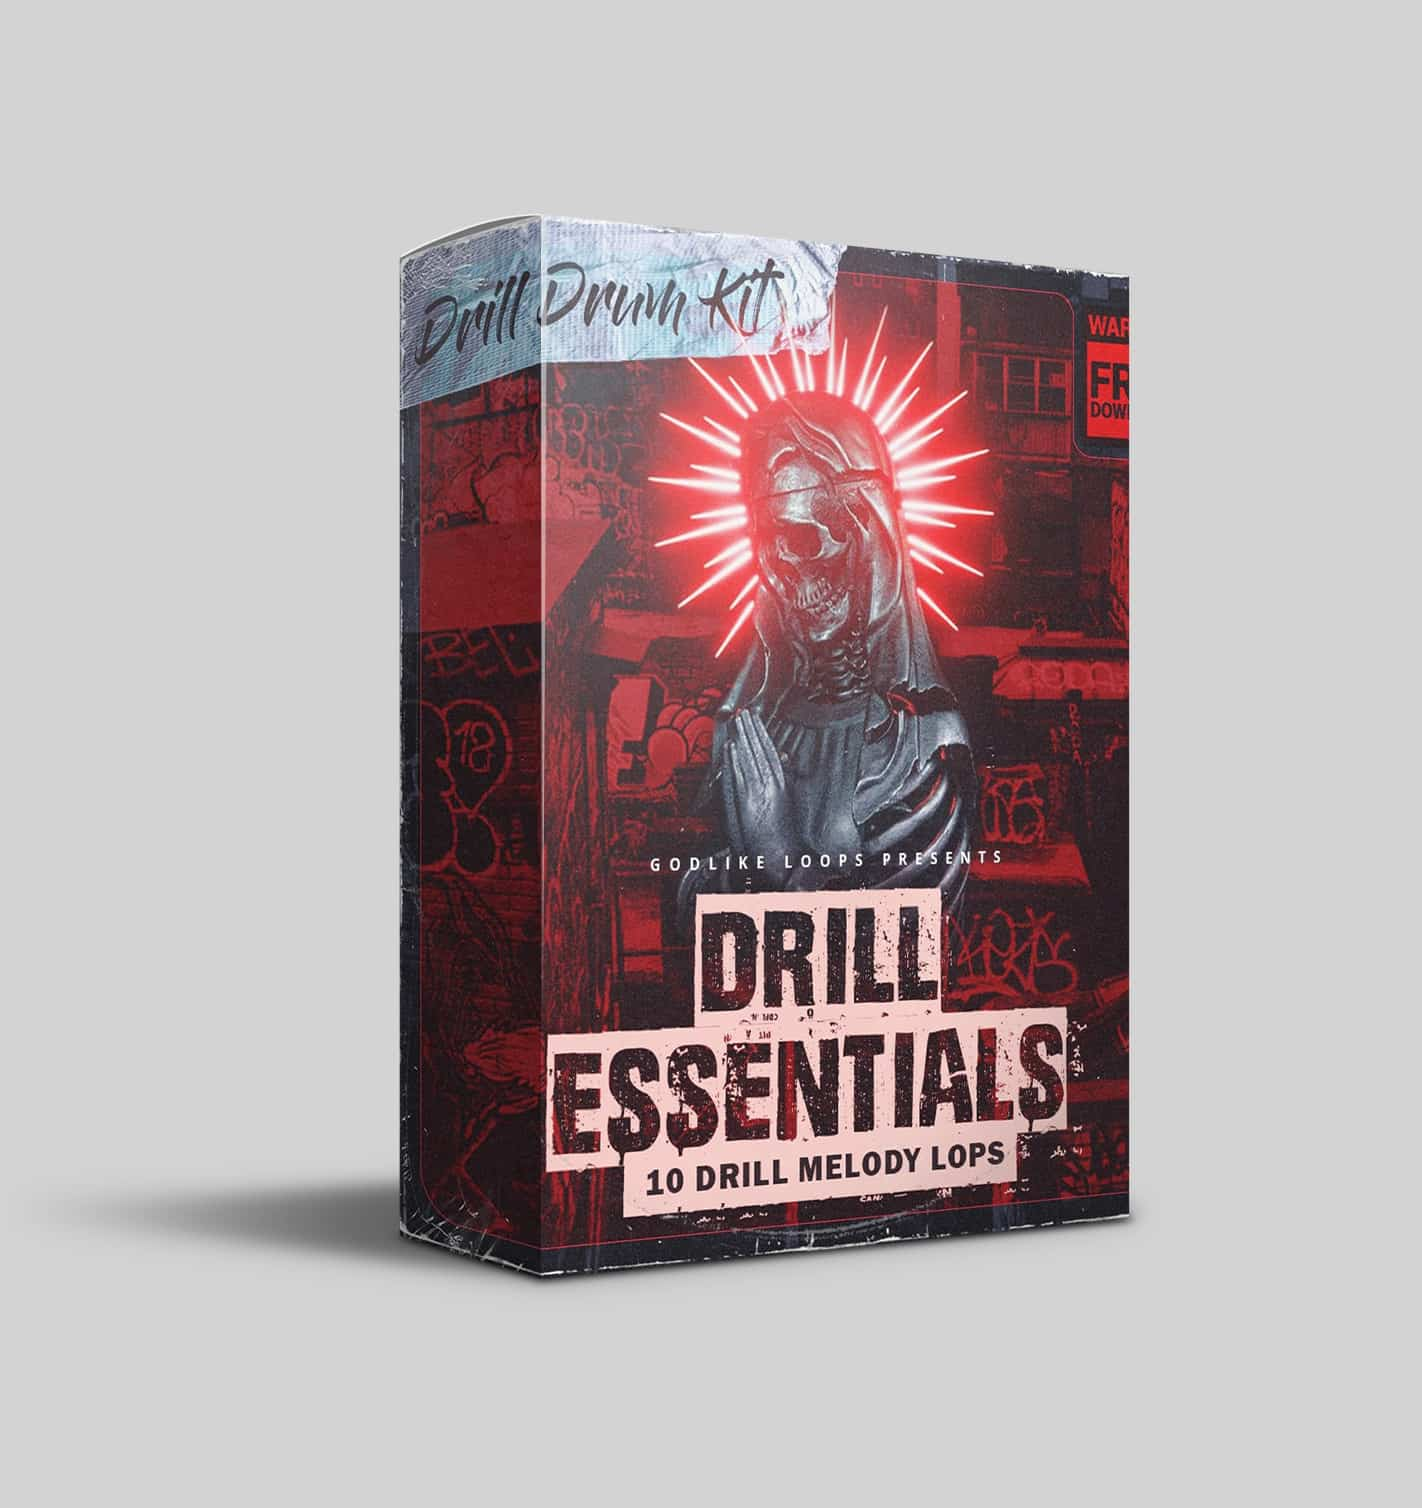 Godlike Loops - Drill Essentails